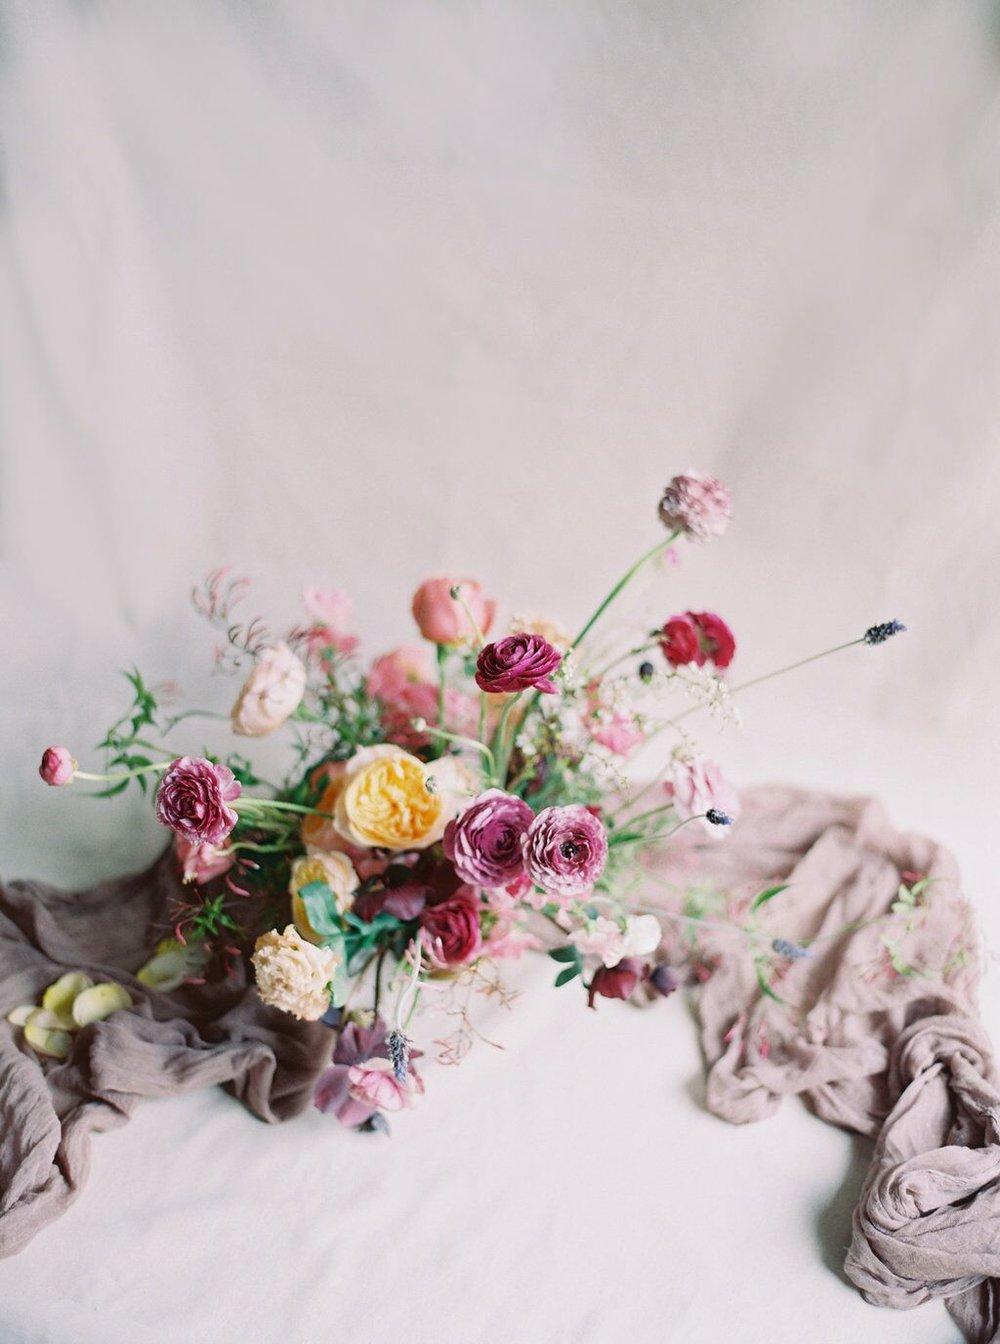 trynhphoto-sandiego-socal-florist-siren-floral-workshop-3_preview.jpg